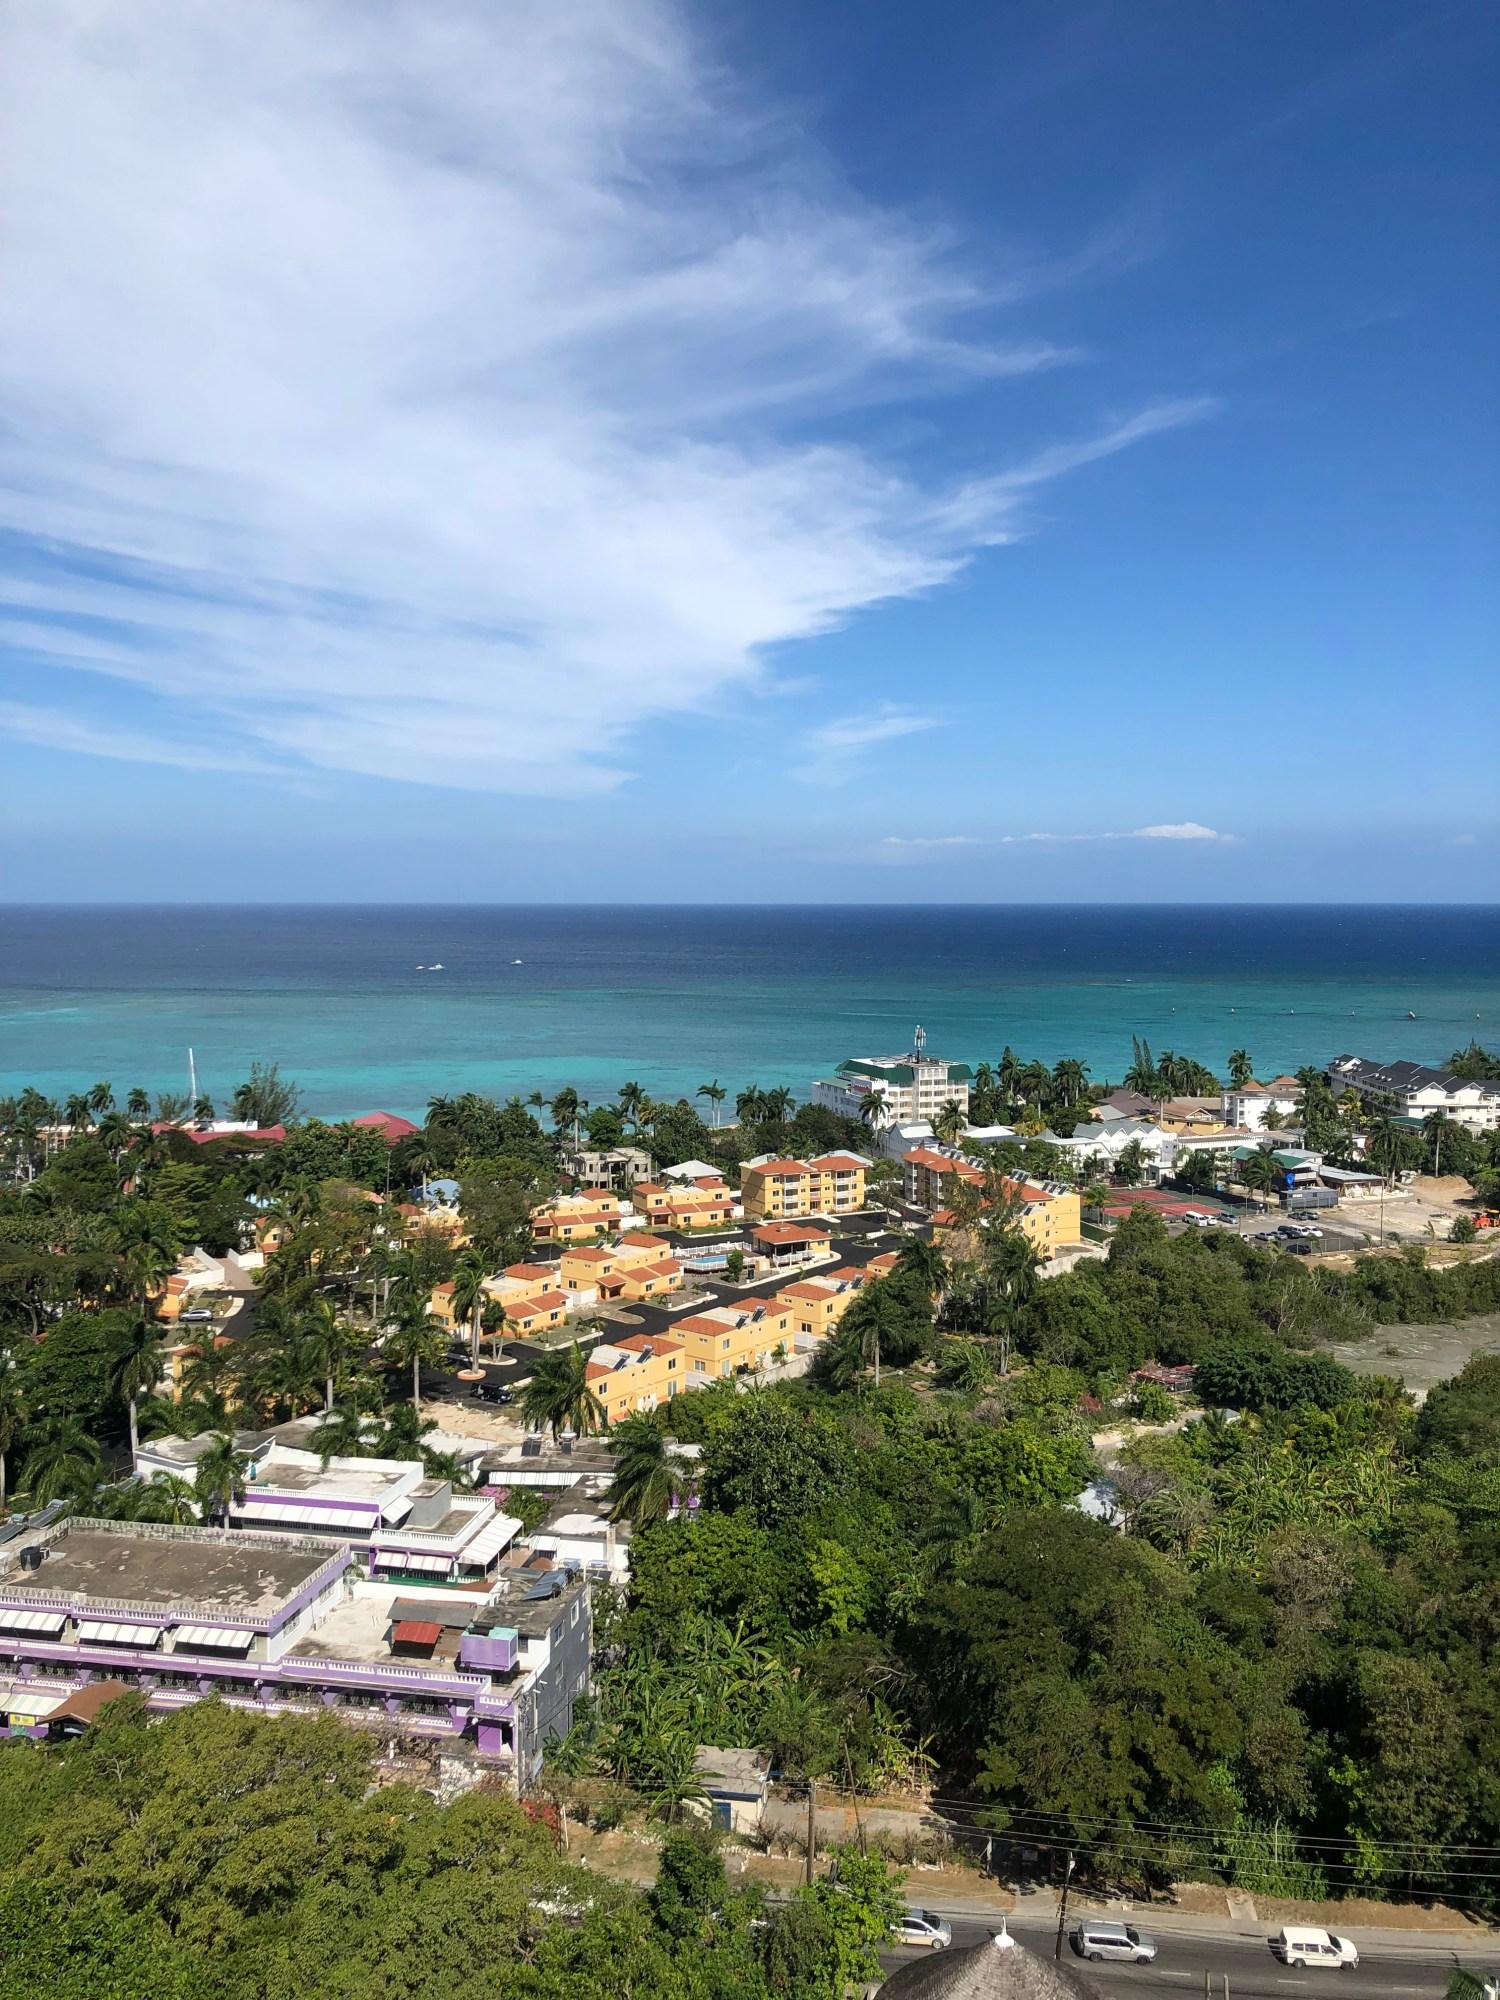 ocean view blue